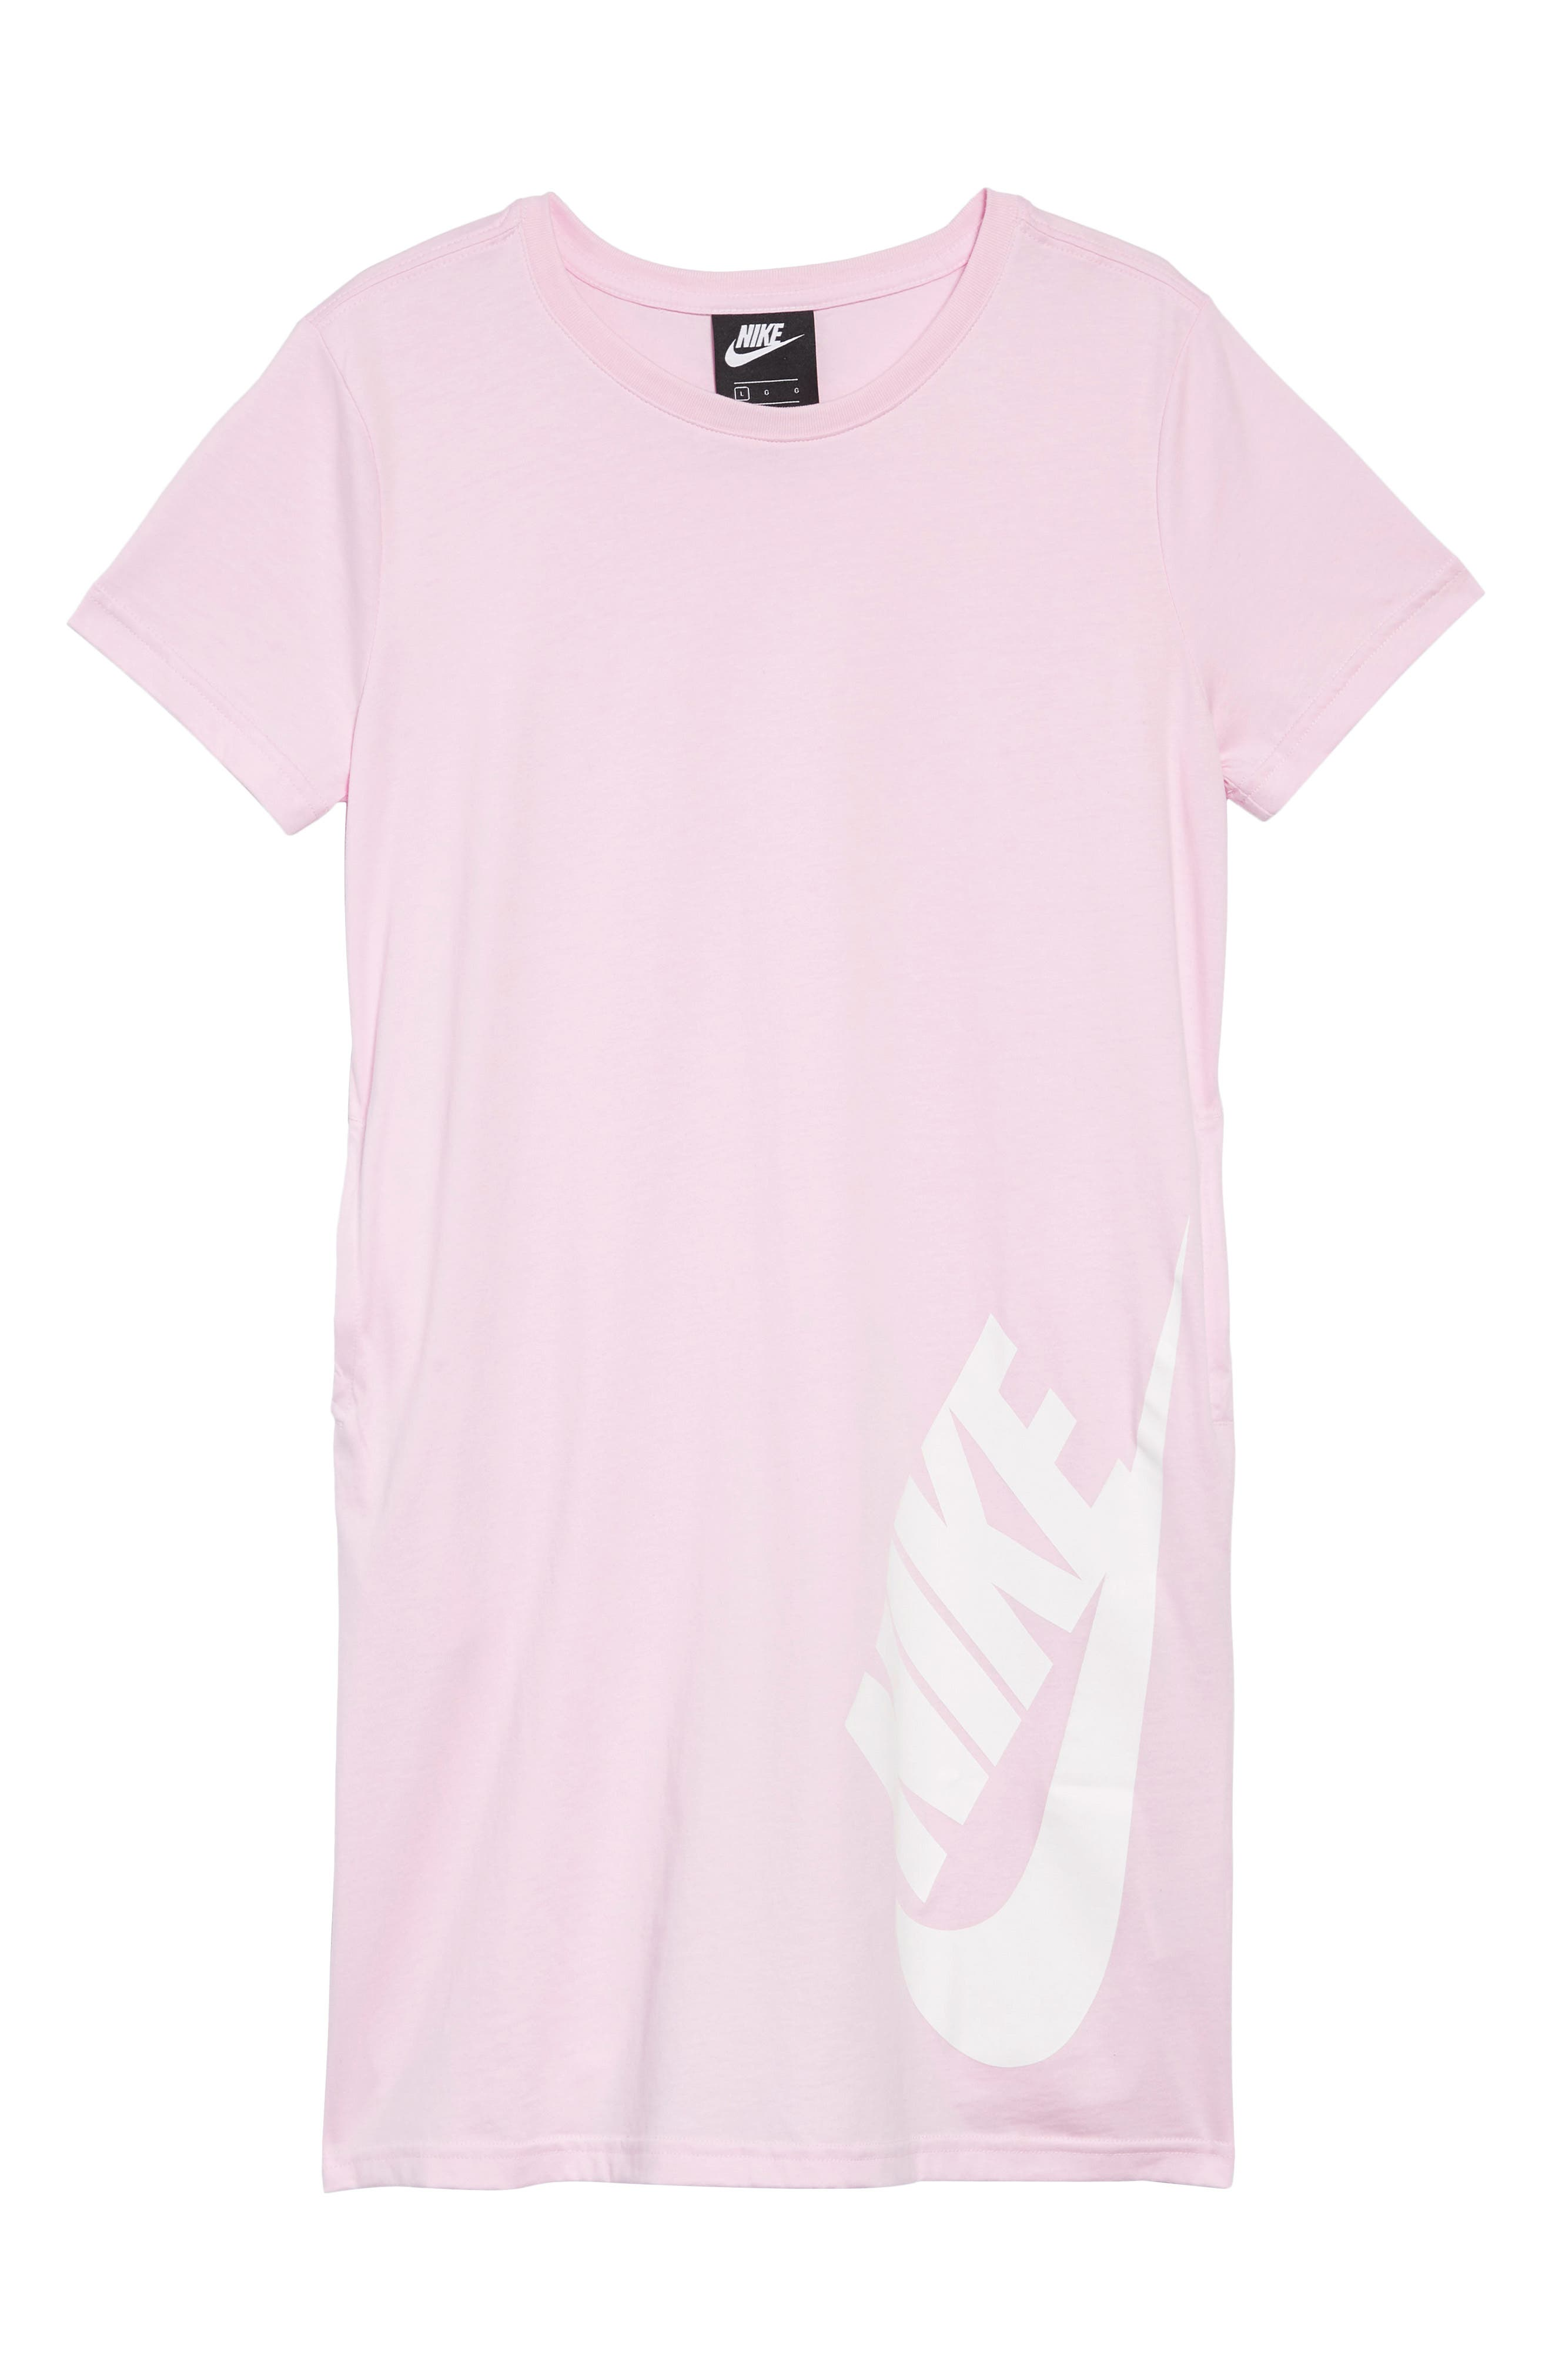 NIKE, Sportswear Logo Shirtdress, Main thumbnail 1, color, PINK FOAM / BORDEAUX